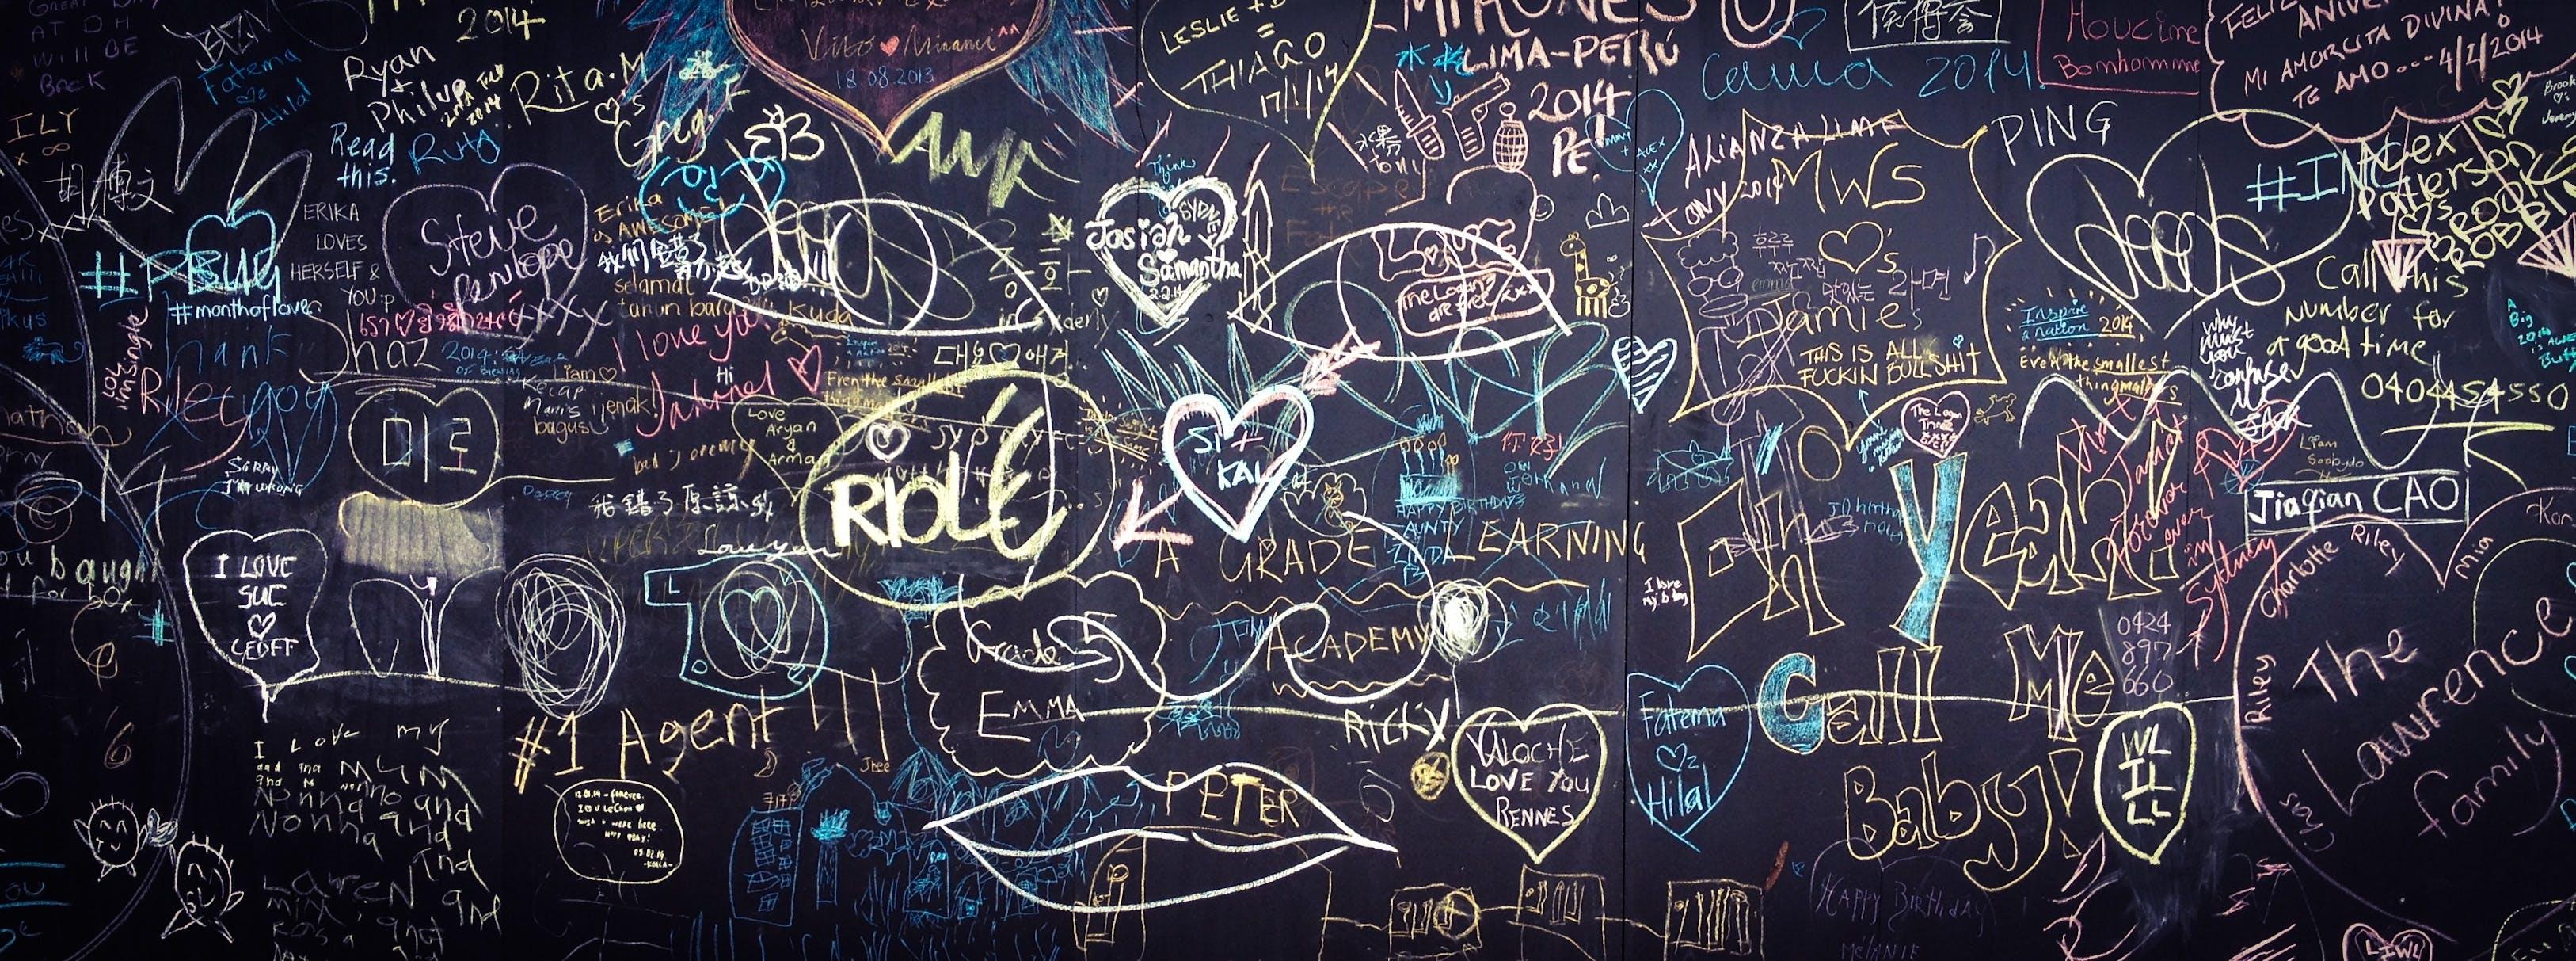 Free stock photo of love, heart, hand, graffiti